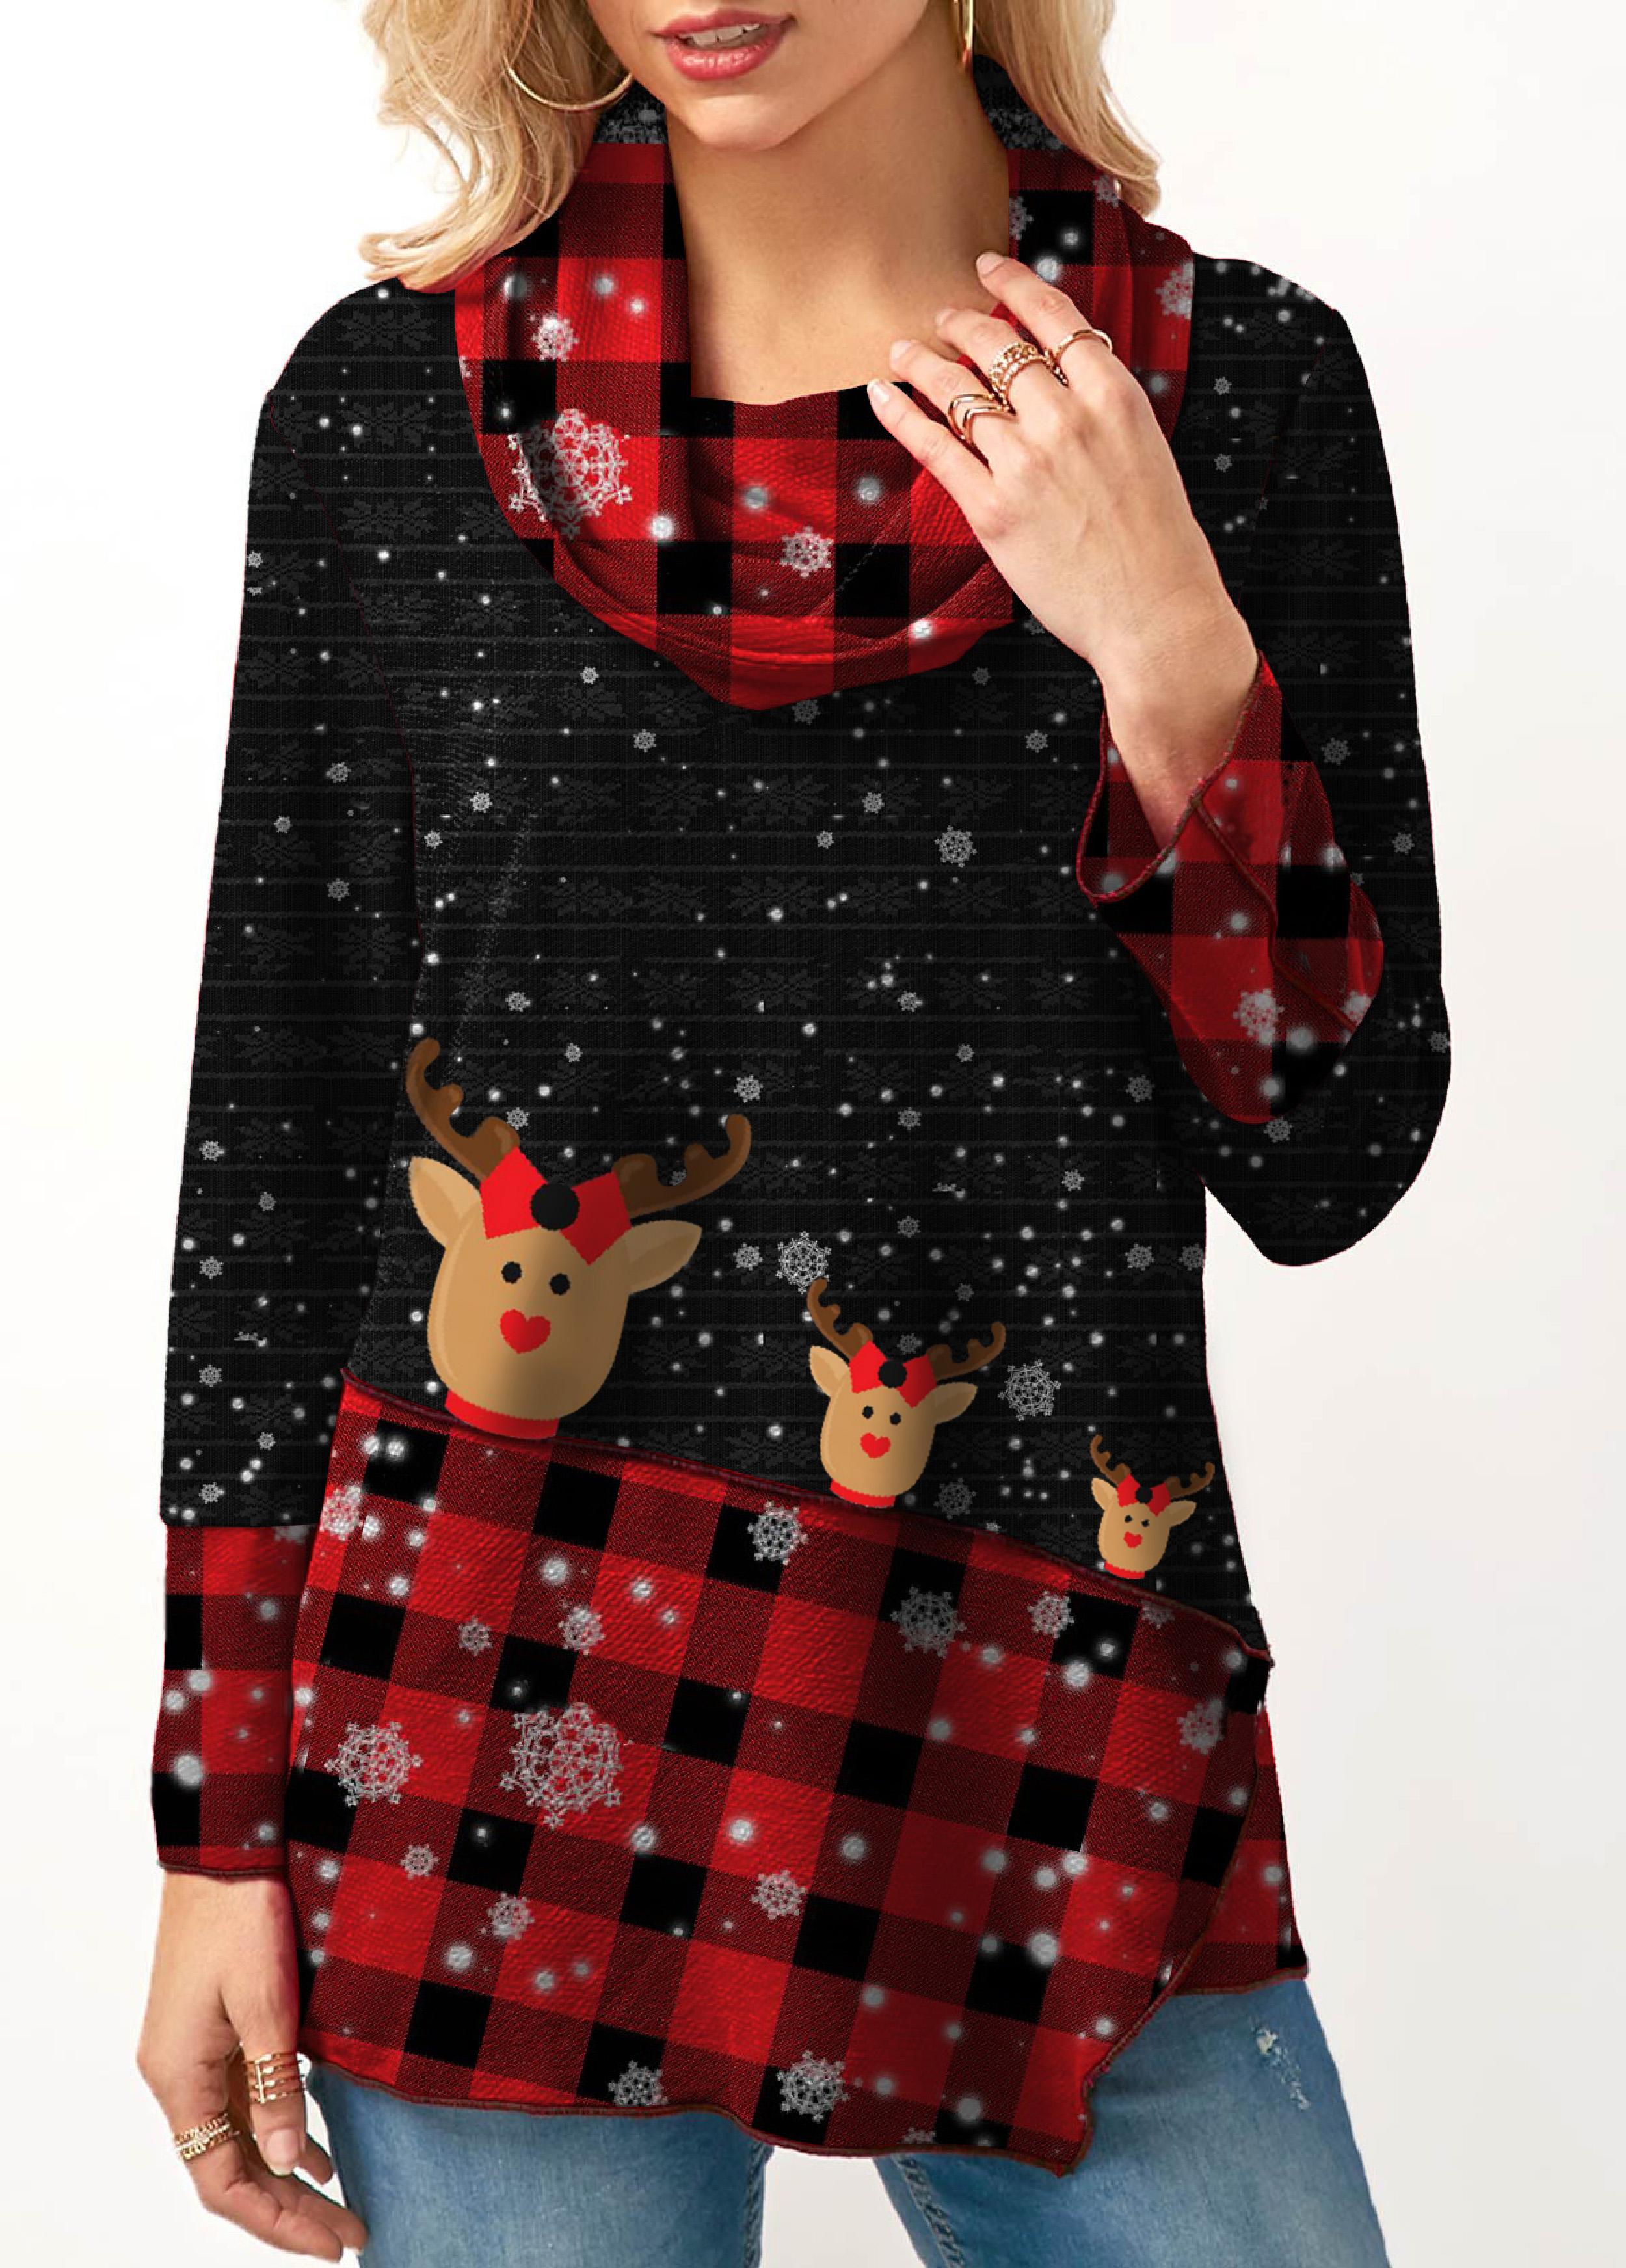 Cowl Neck Plaid Print Long Sleeve Christmas Sweatshirt